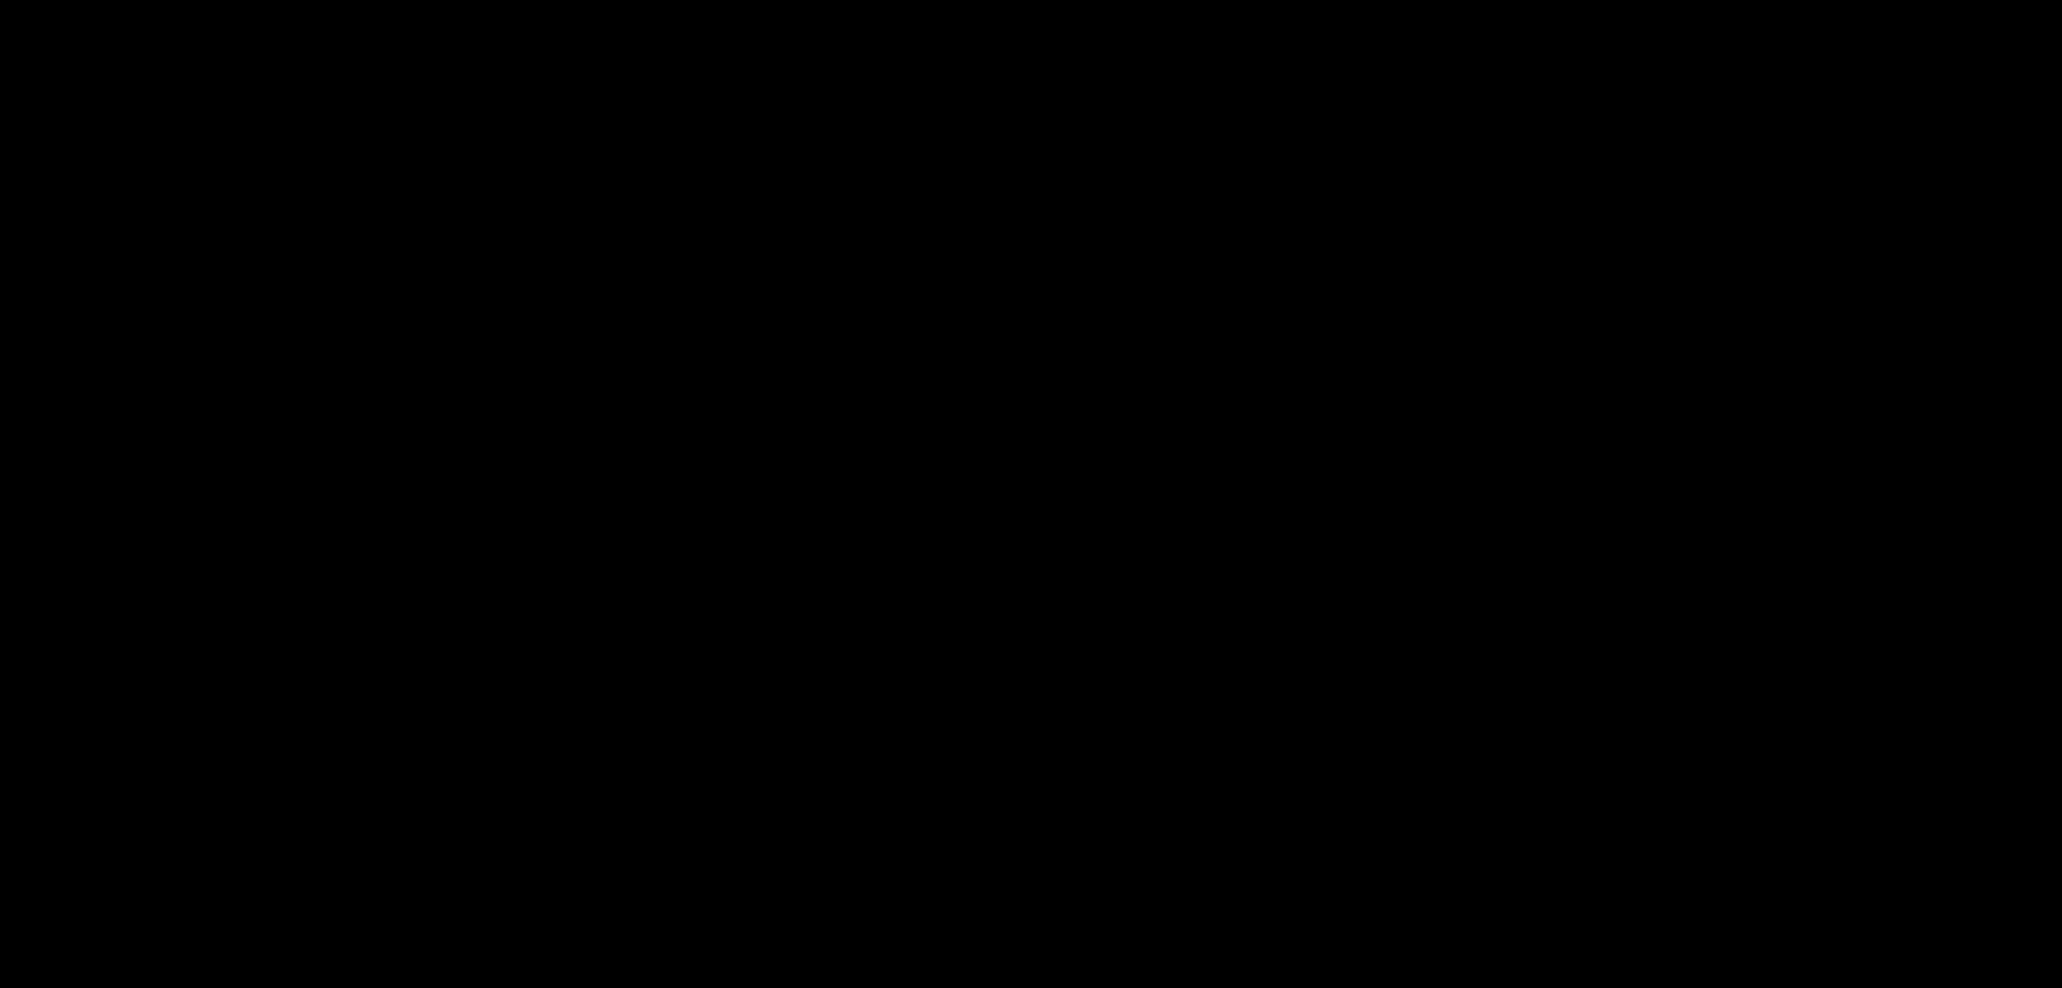 8-Dansyl-N-hydroxyoctanamide